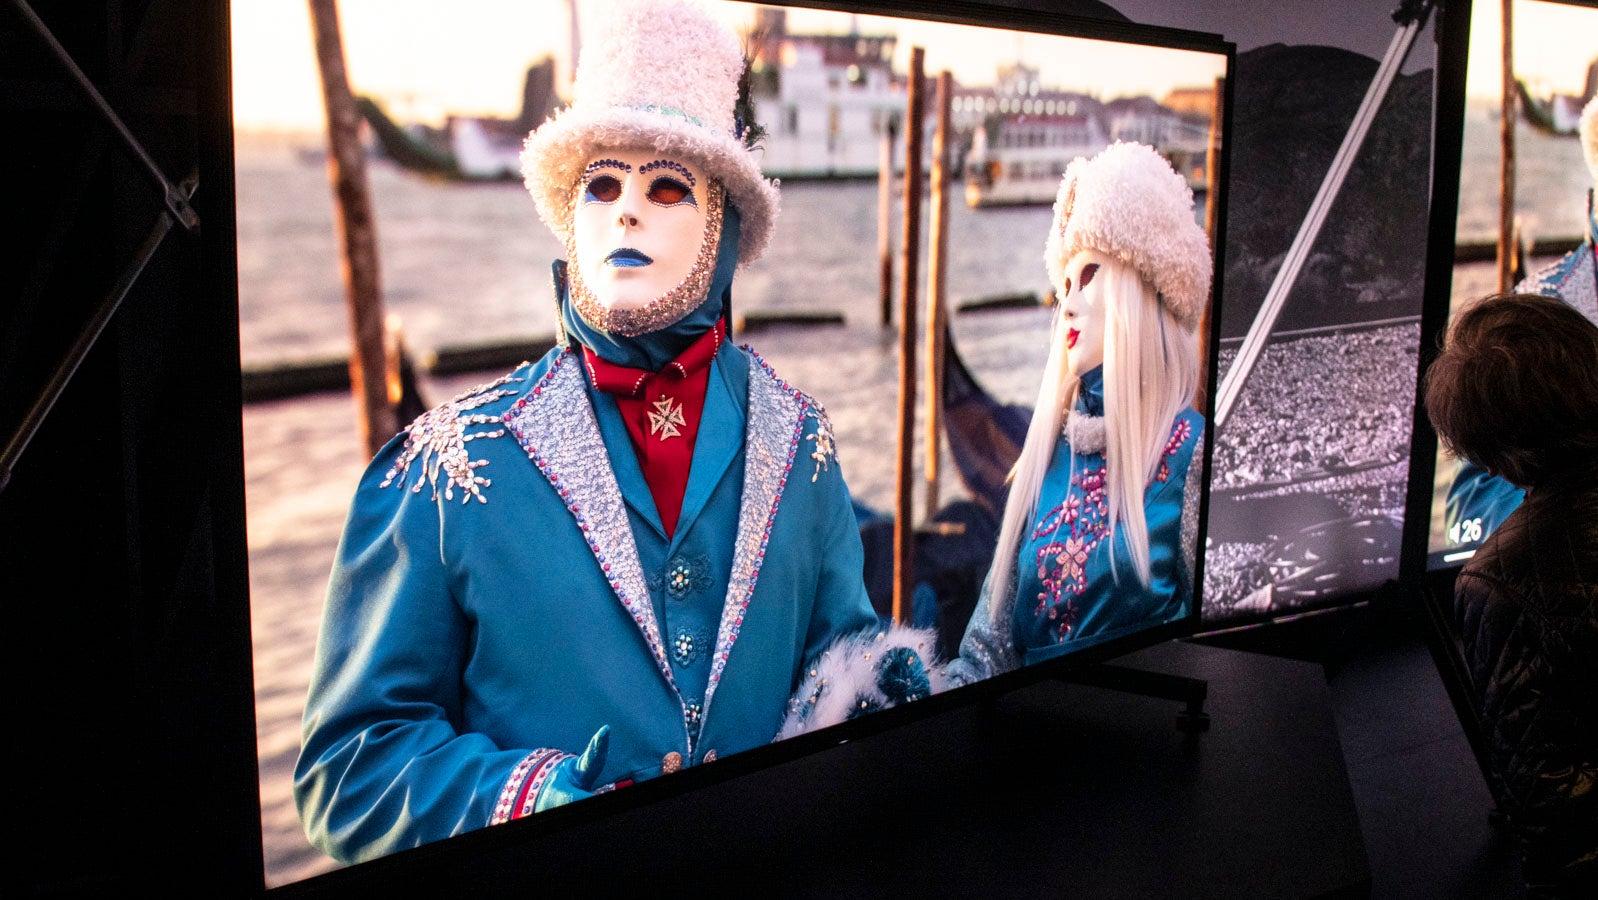 8k 8k-tvs ces-2019 samsung sony televisions